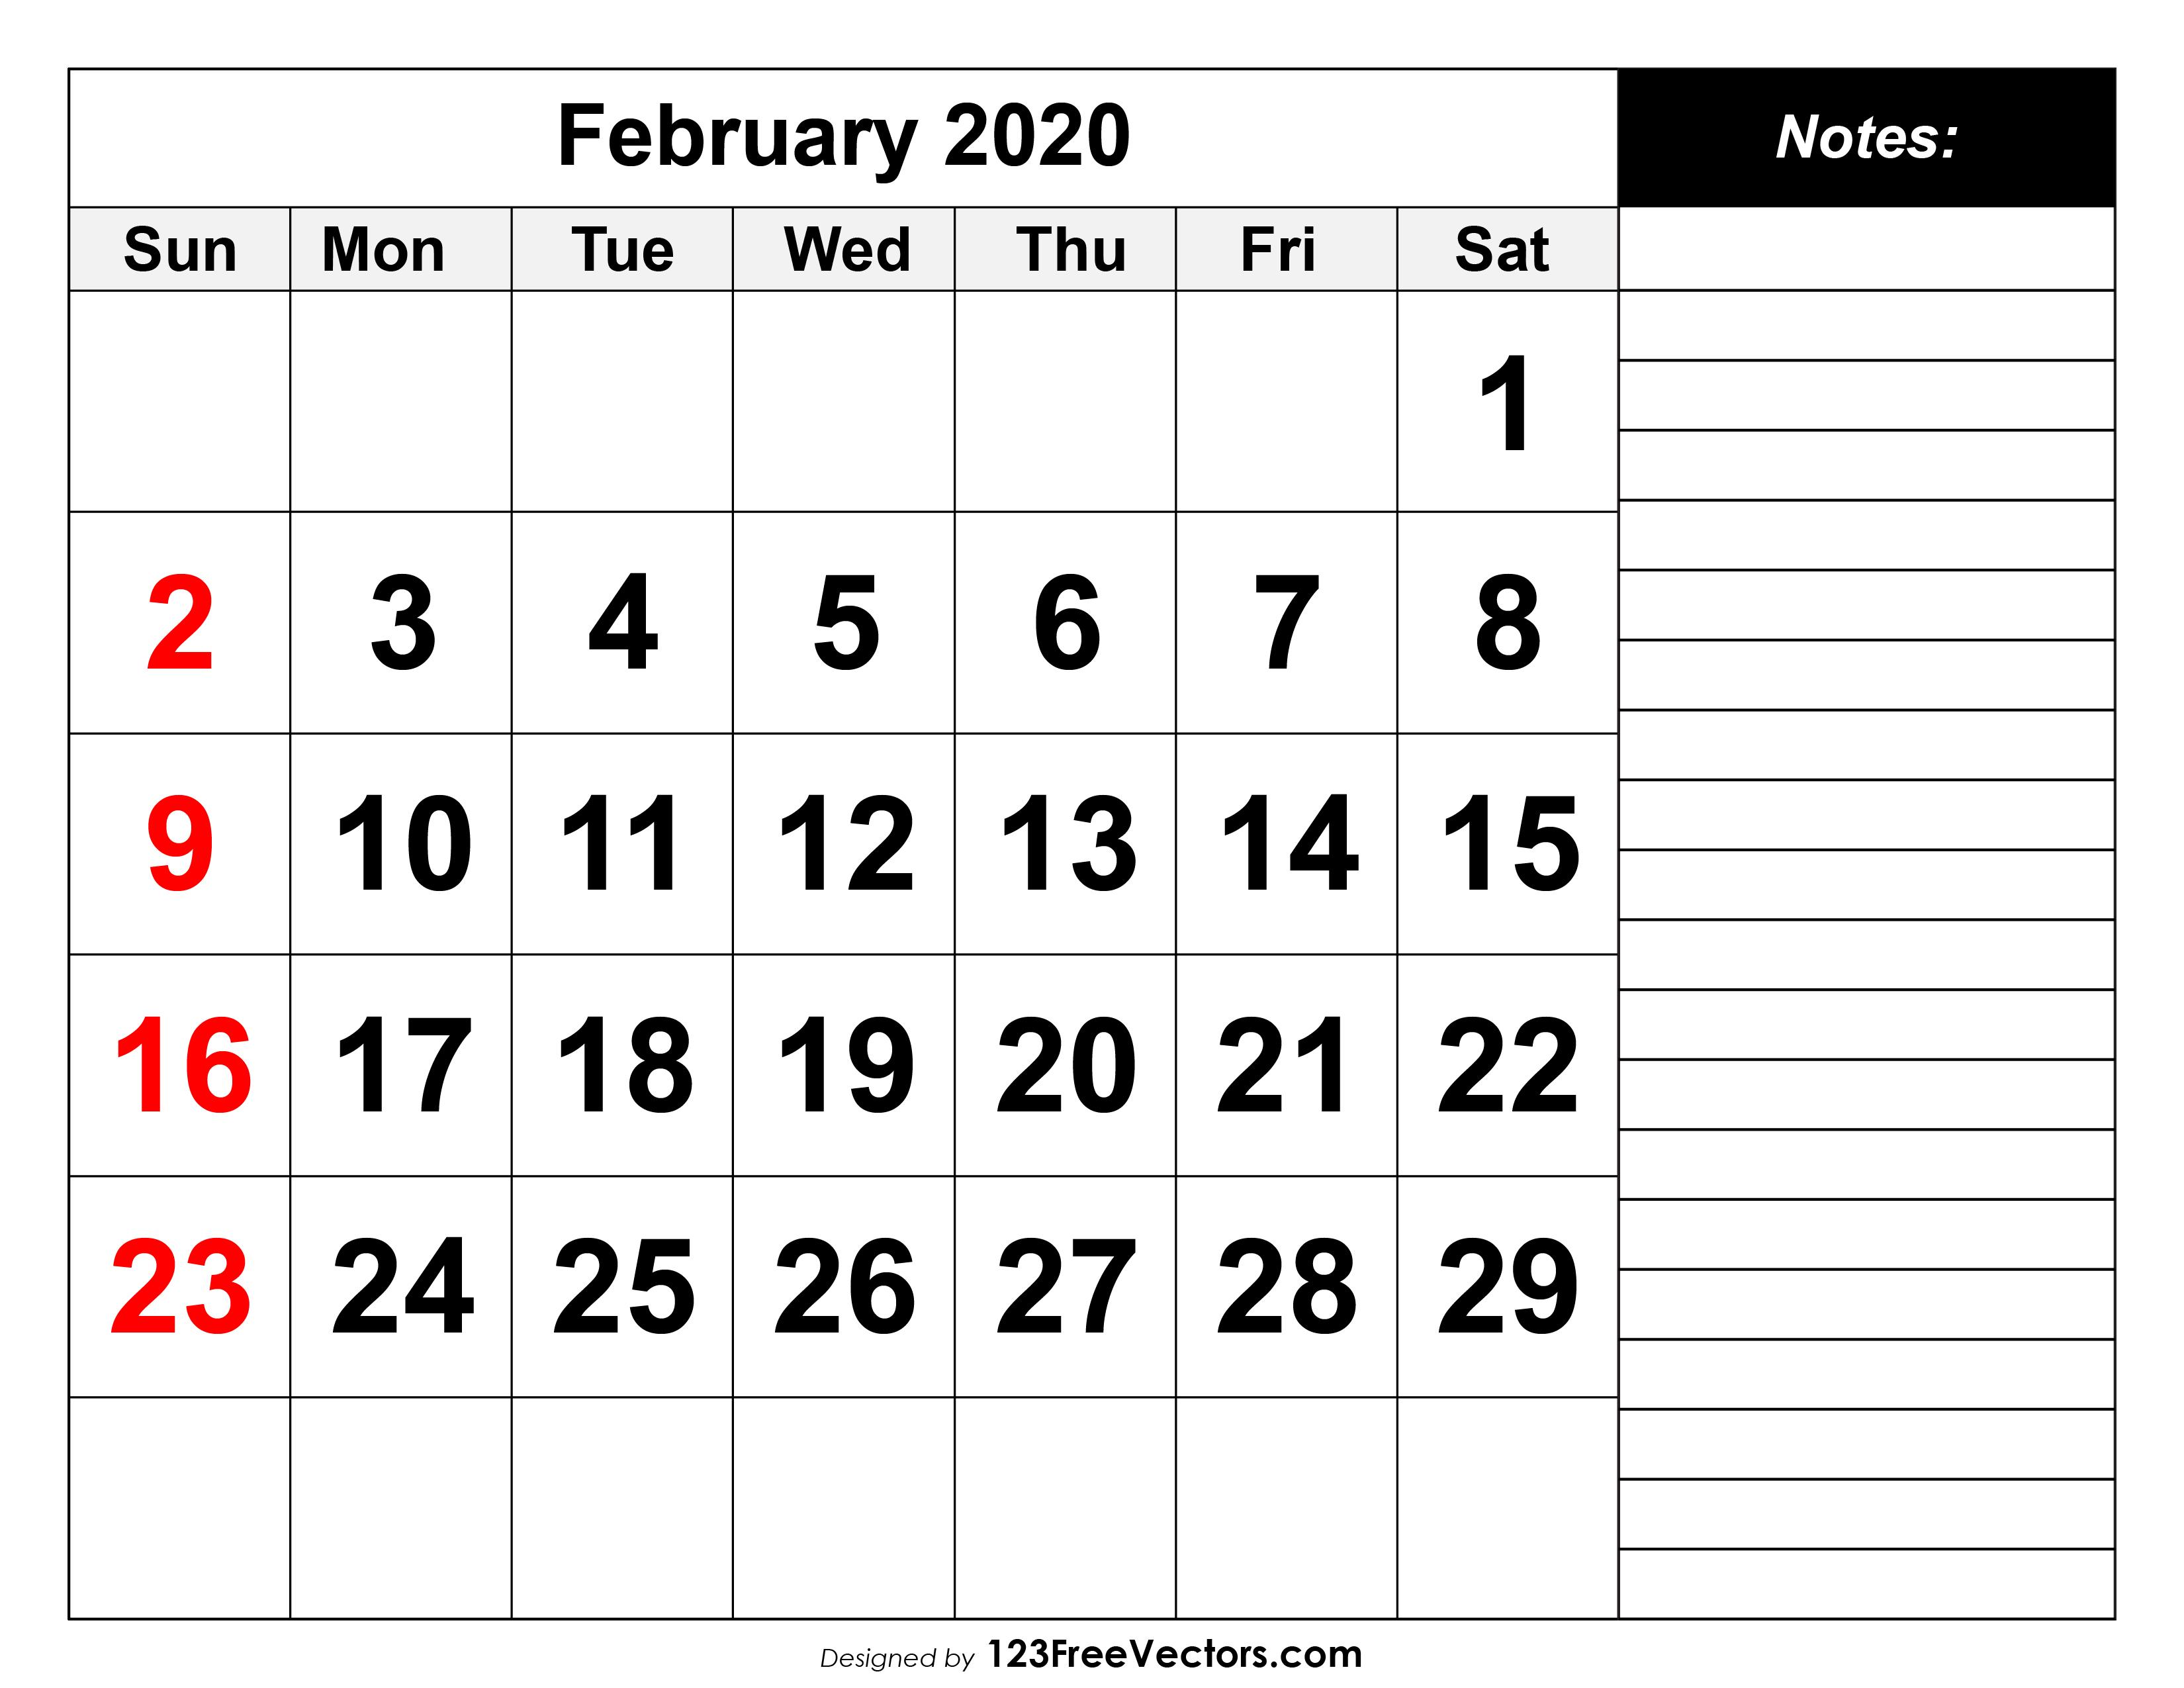 2020 February Calendar Printable.February 2020 Printable Calendar